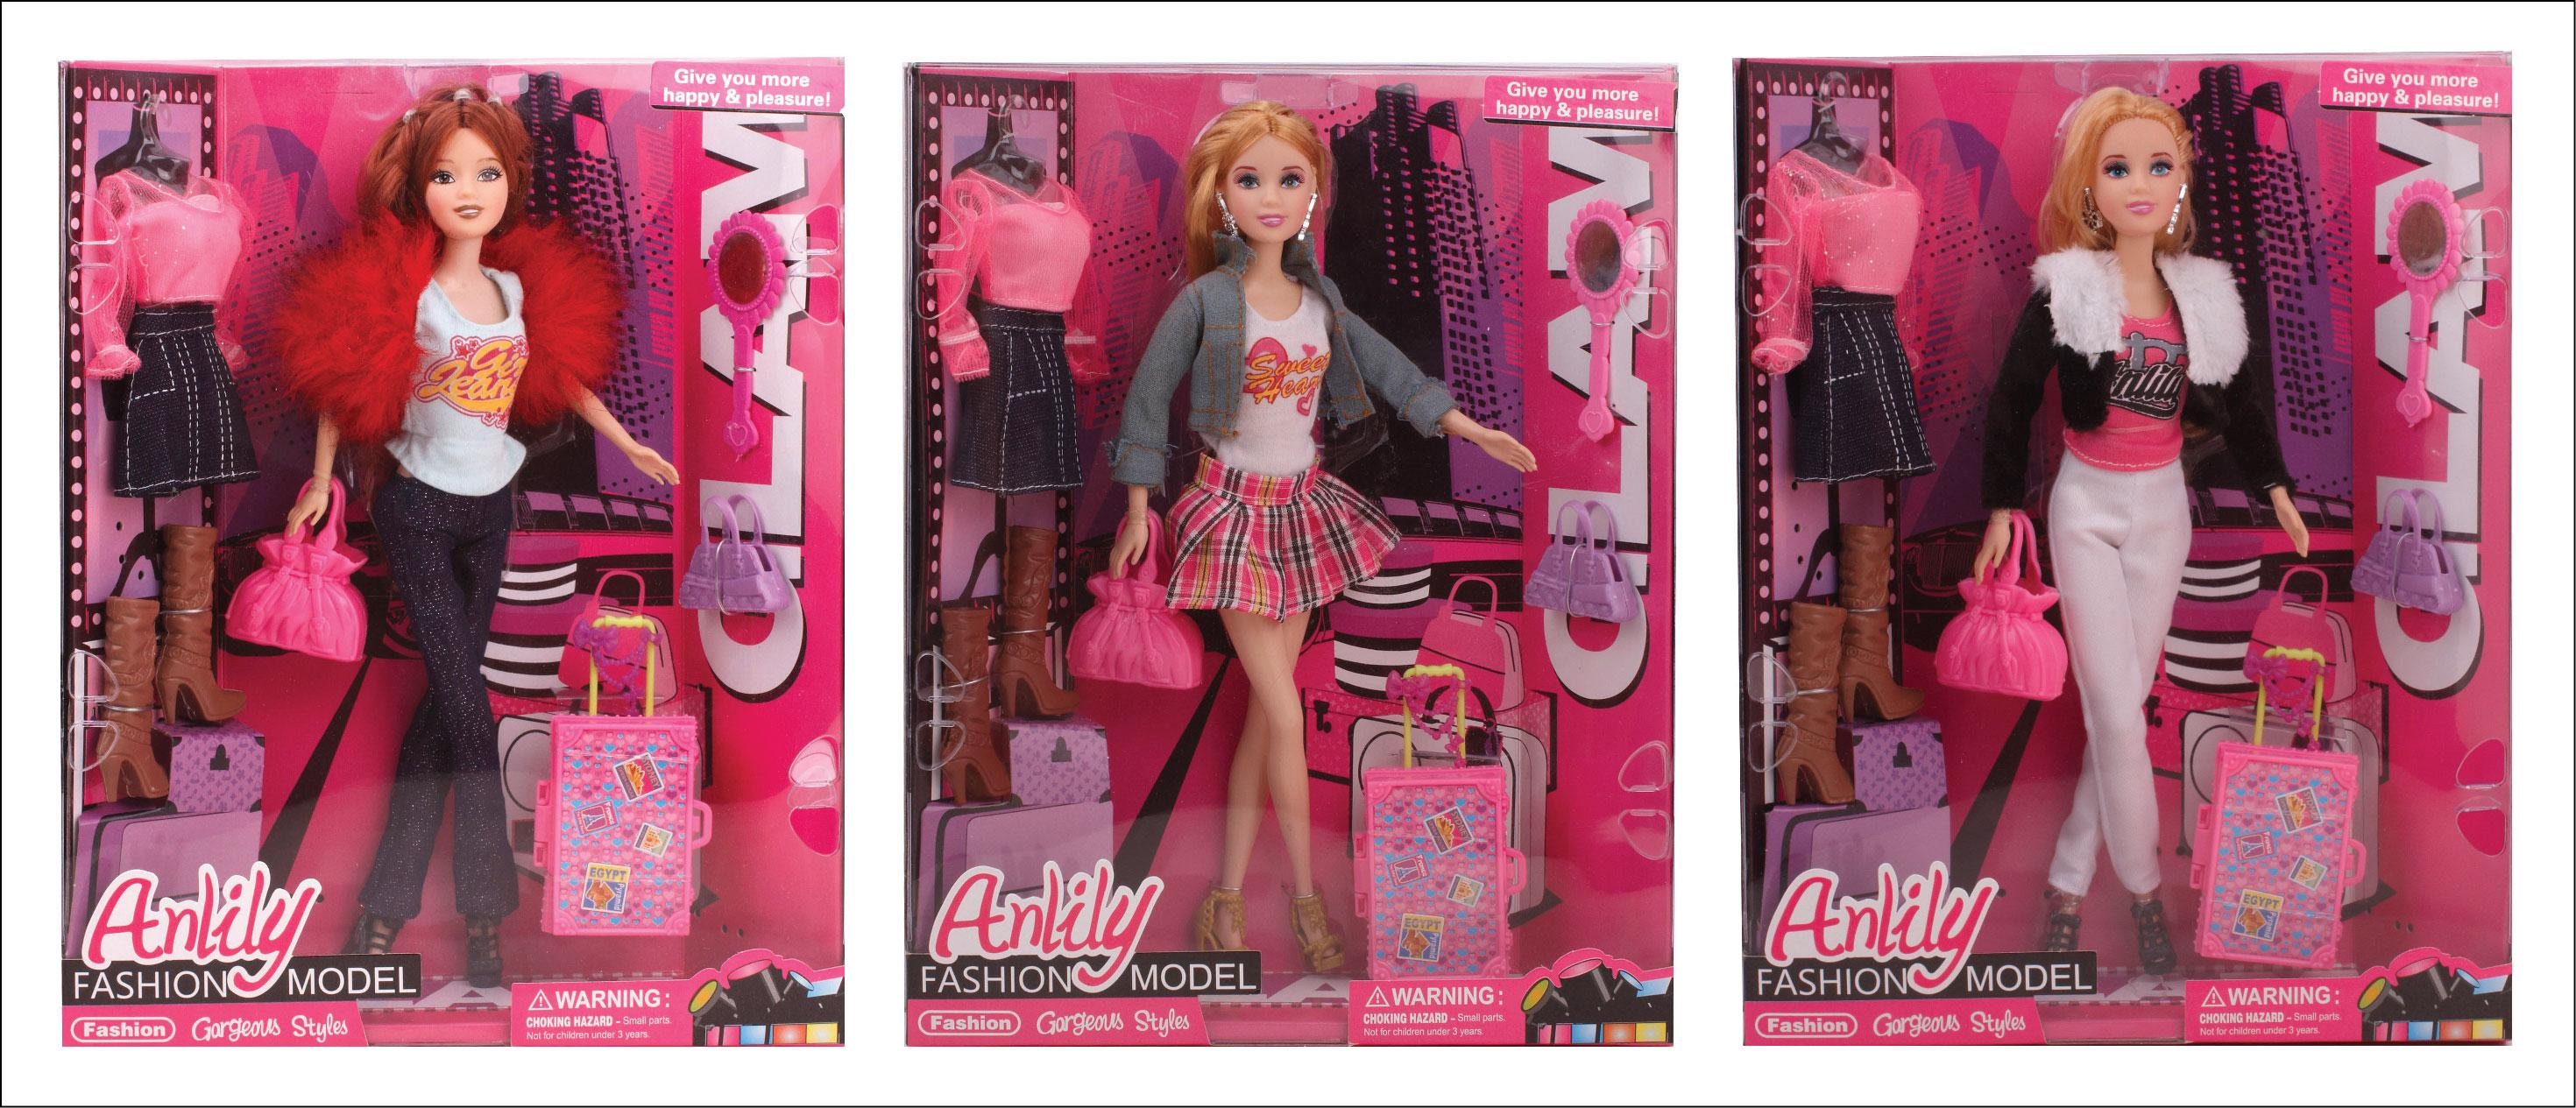 Barbie Toys For Girls : Barbie dolls for girls imgkid the image kid